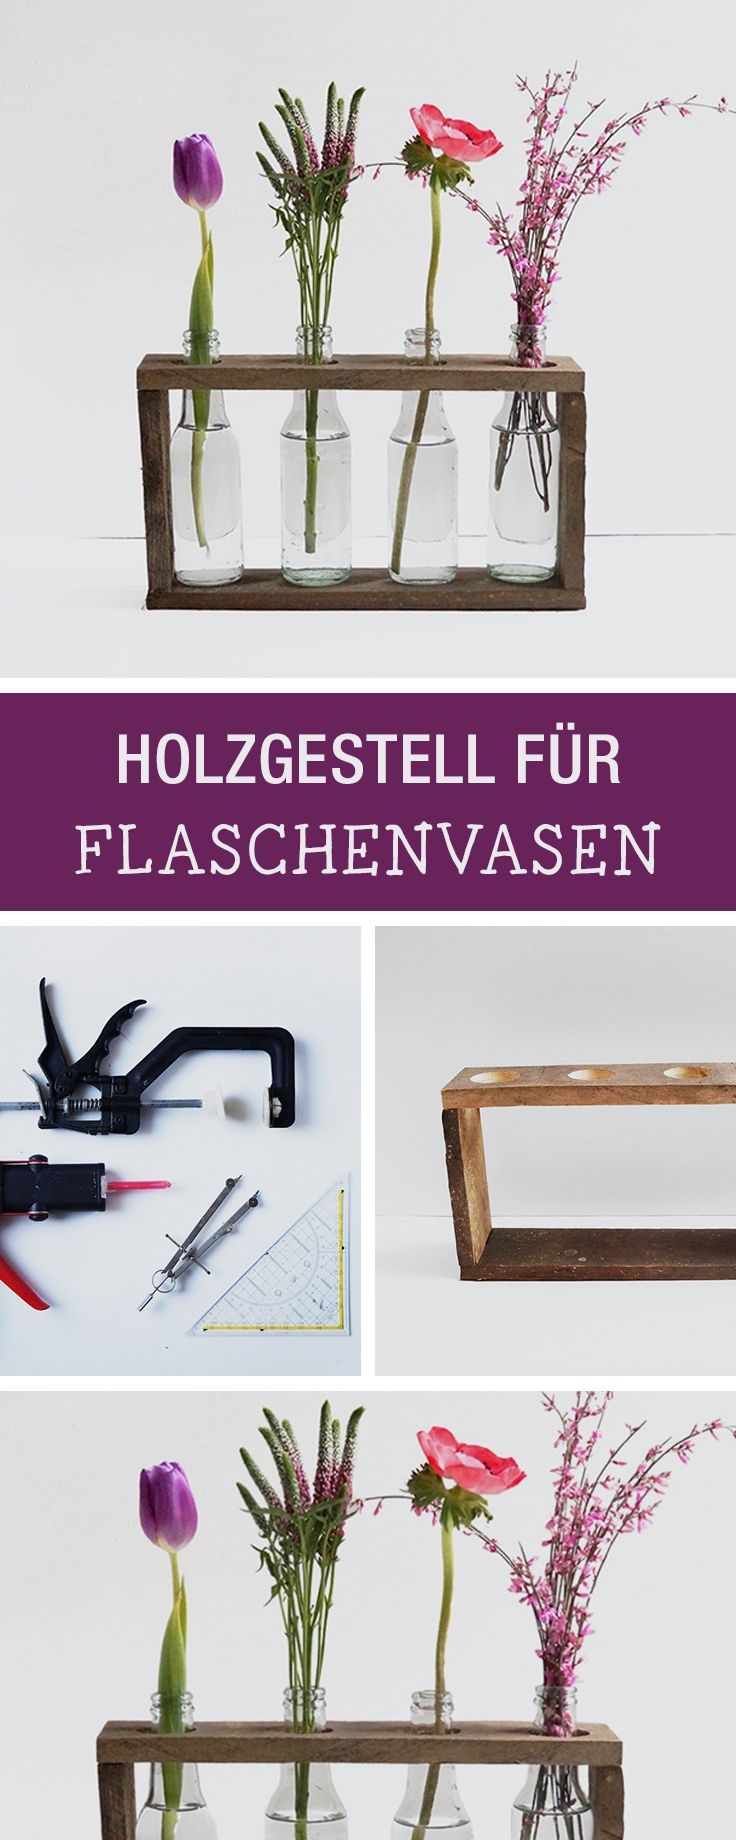 DIY-Inspiration: Holzgestell für Vasen aus Flaschen / wooden flower pot holders via DaWanda.com